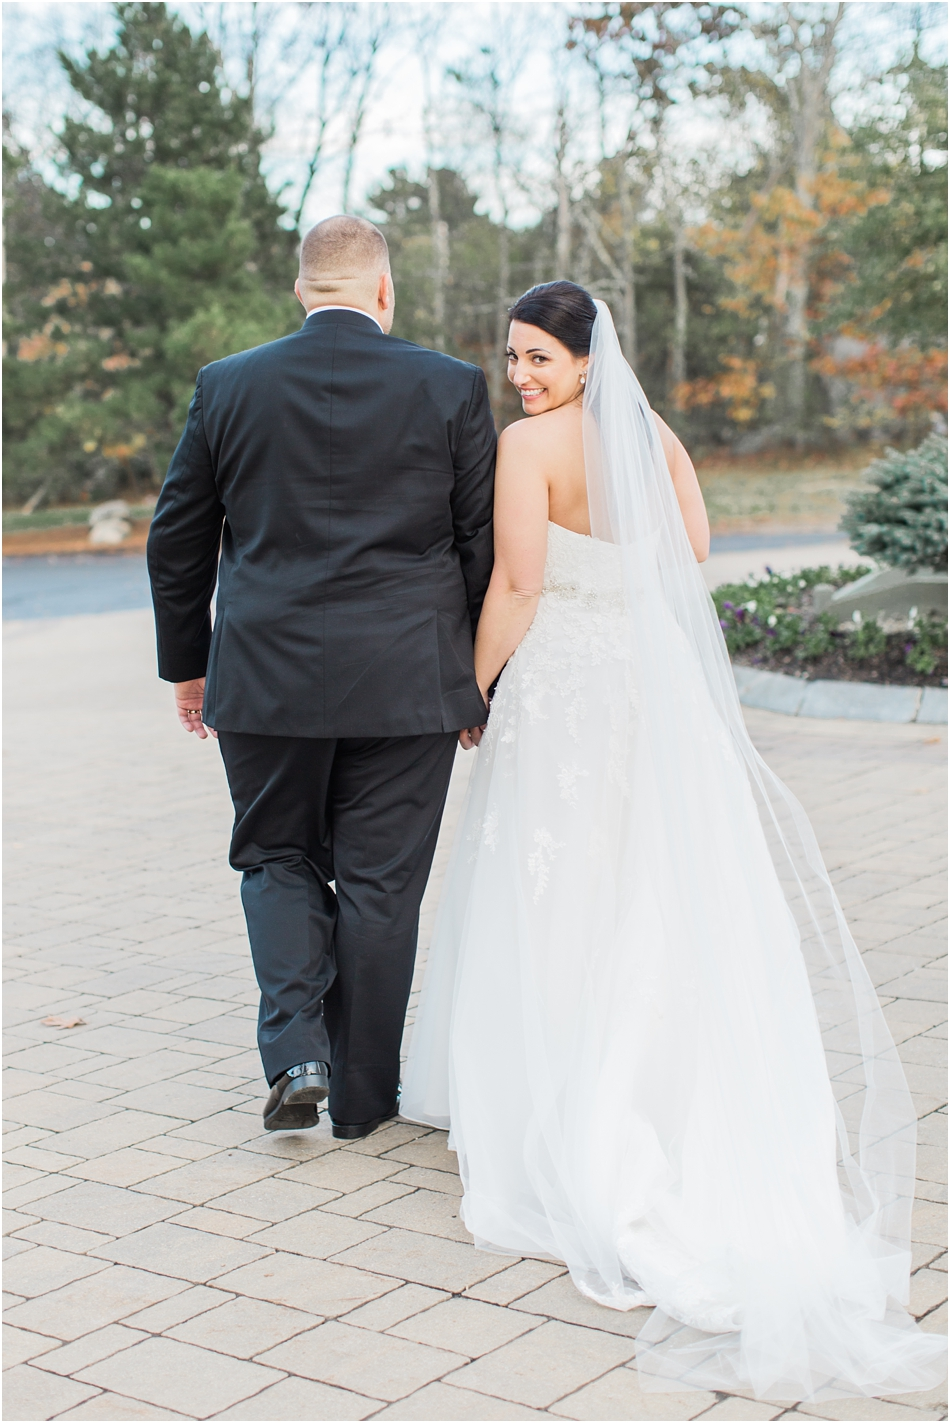 north_reading_lauren_sal_ballroom_cape_cod_boston_new_england_wedding_photographer_Meredith_Jane_Photography_photo_0128.jpg